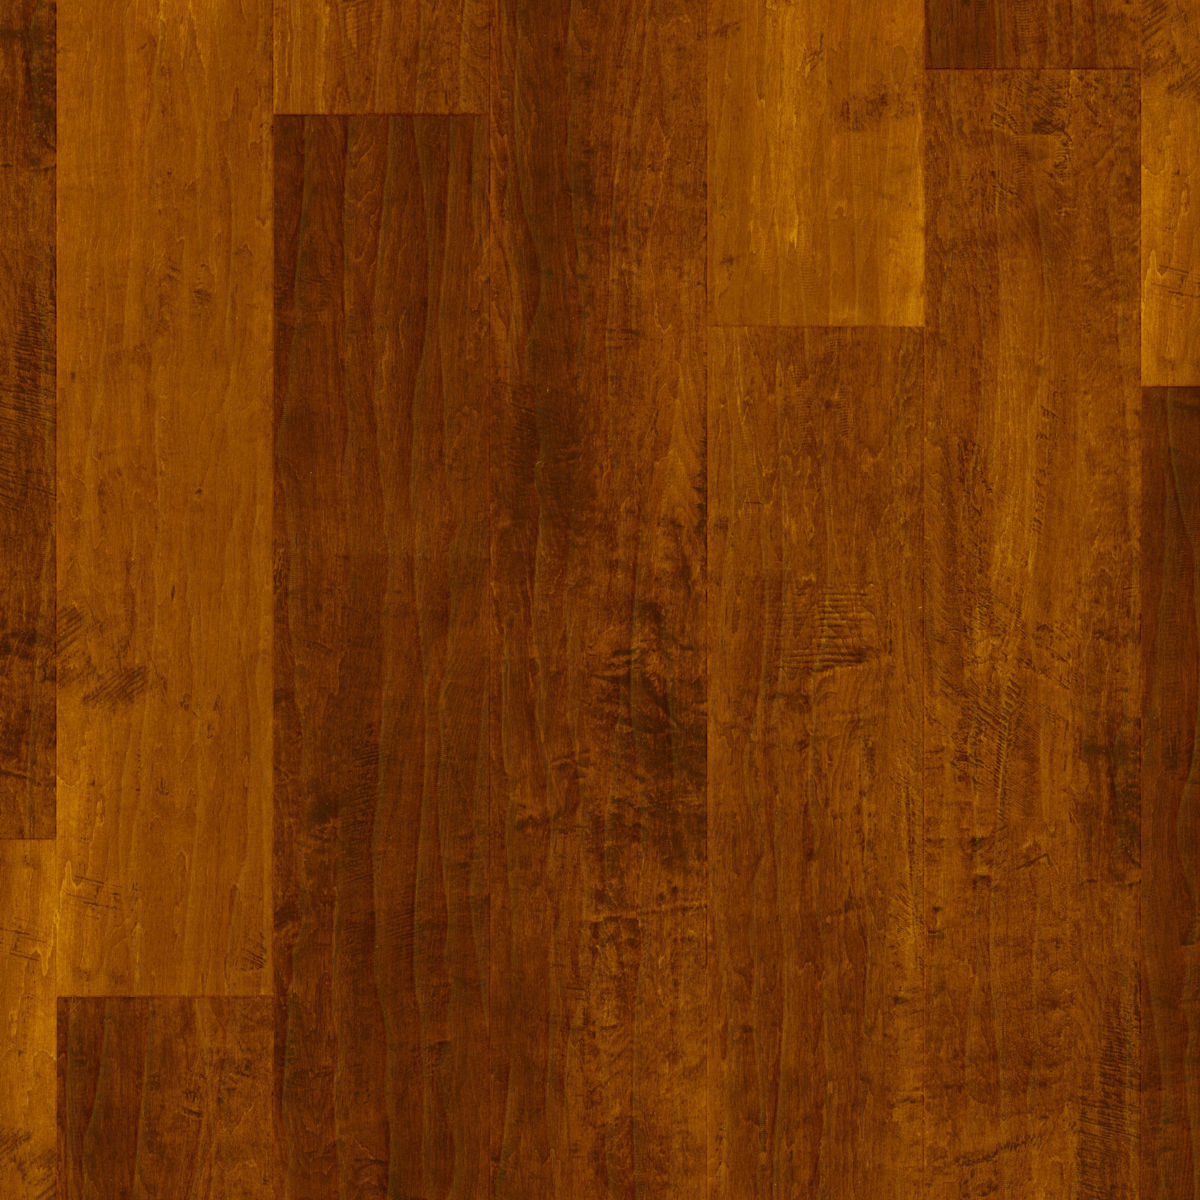 Karndean art select santina cherry rl07 vinyl flooring for Art select parquet